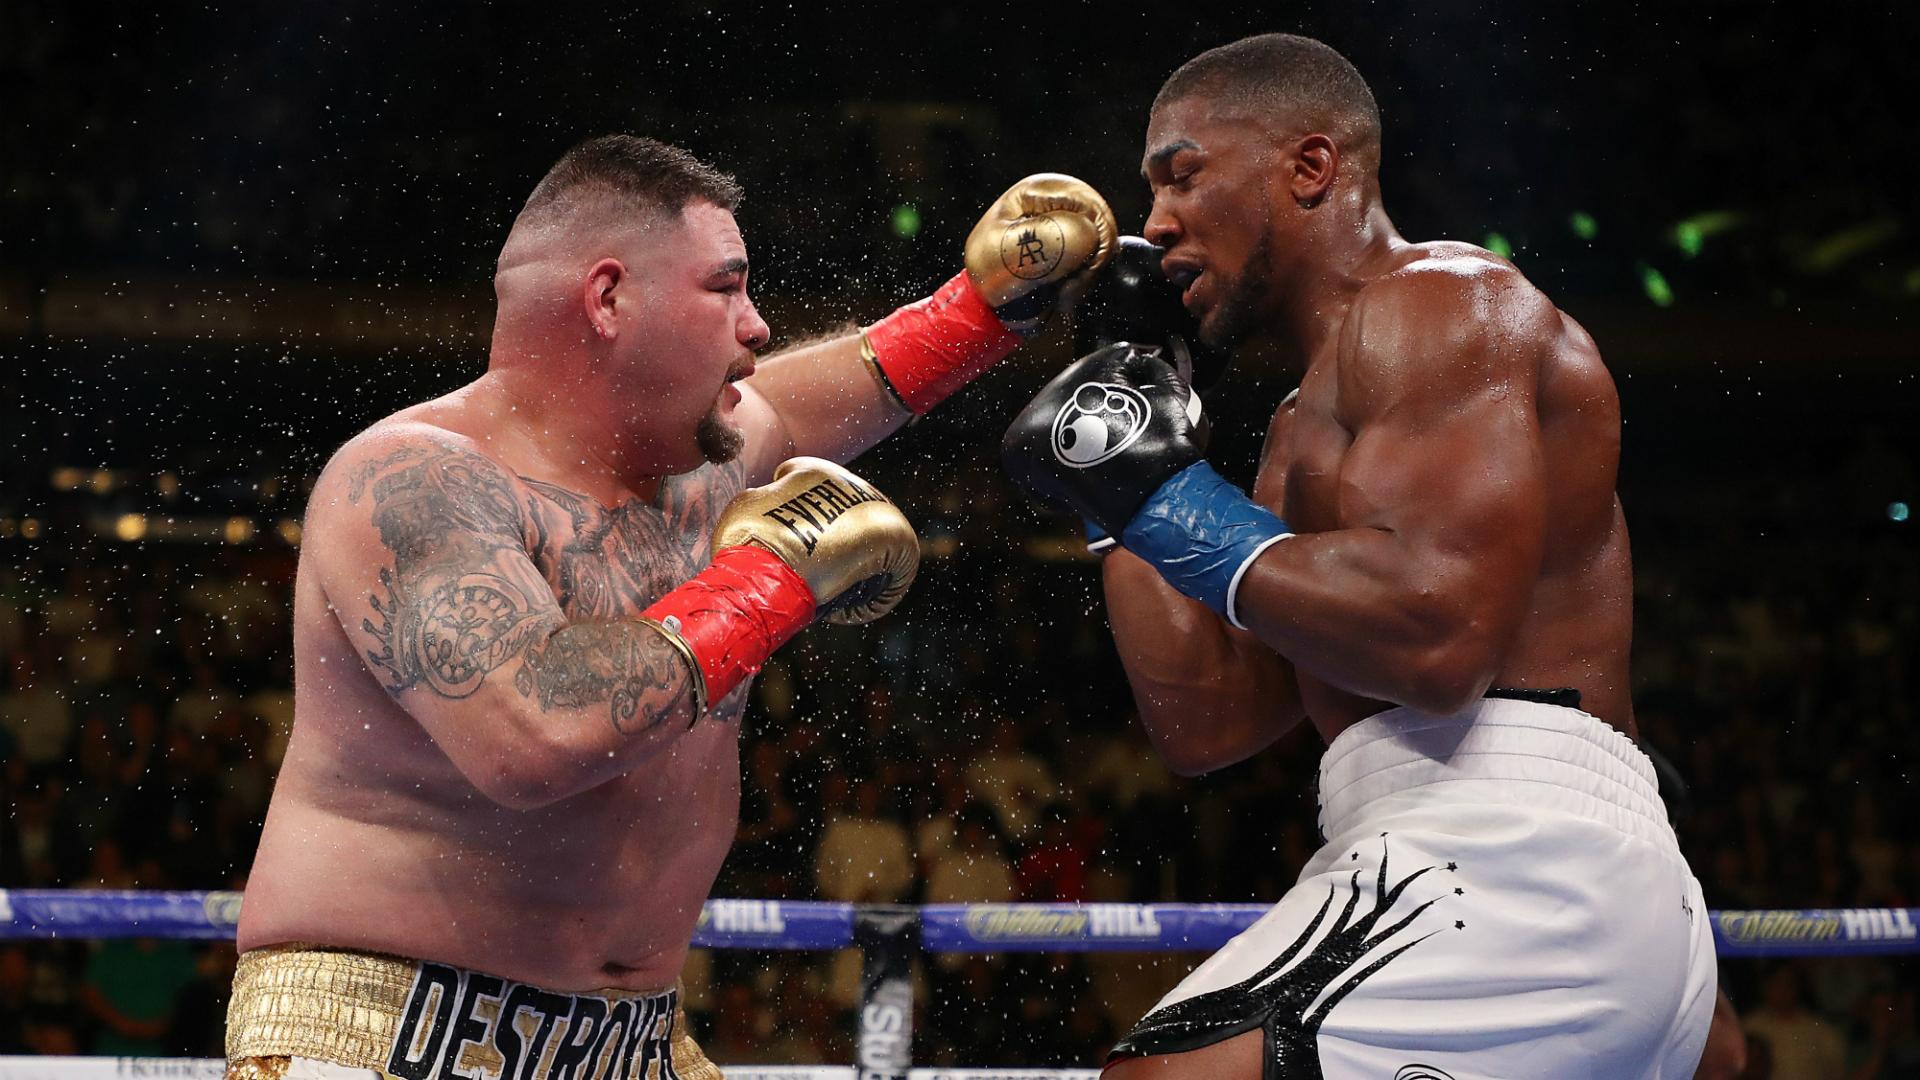 Joshua-Ruiz in Saudi Arabia can change boxing forever - Hearn